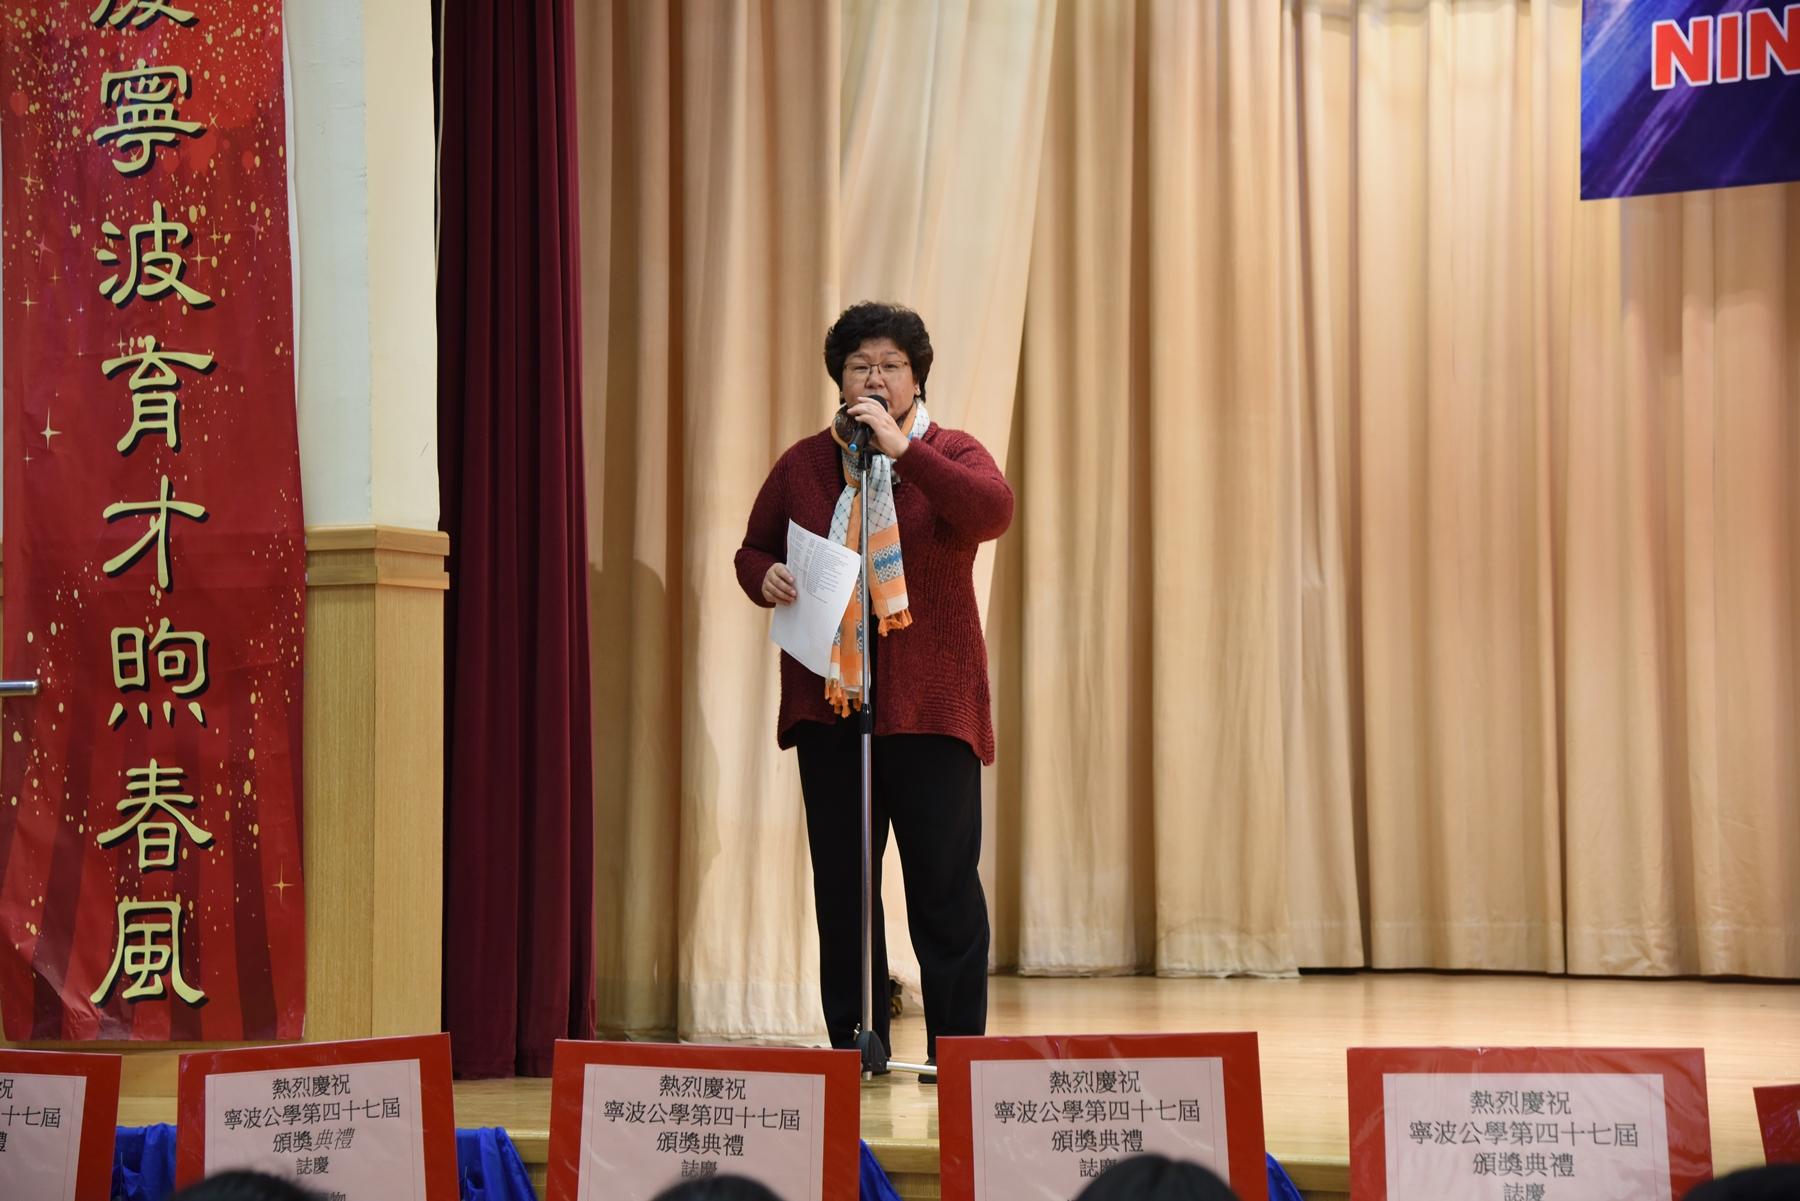 http://npc.edu.hk/sites/default/files/dsc_8620.jpg